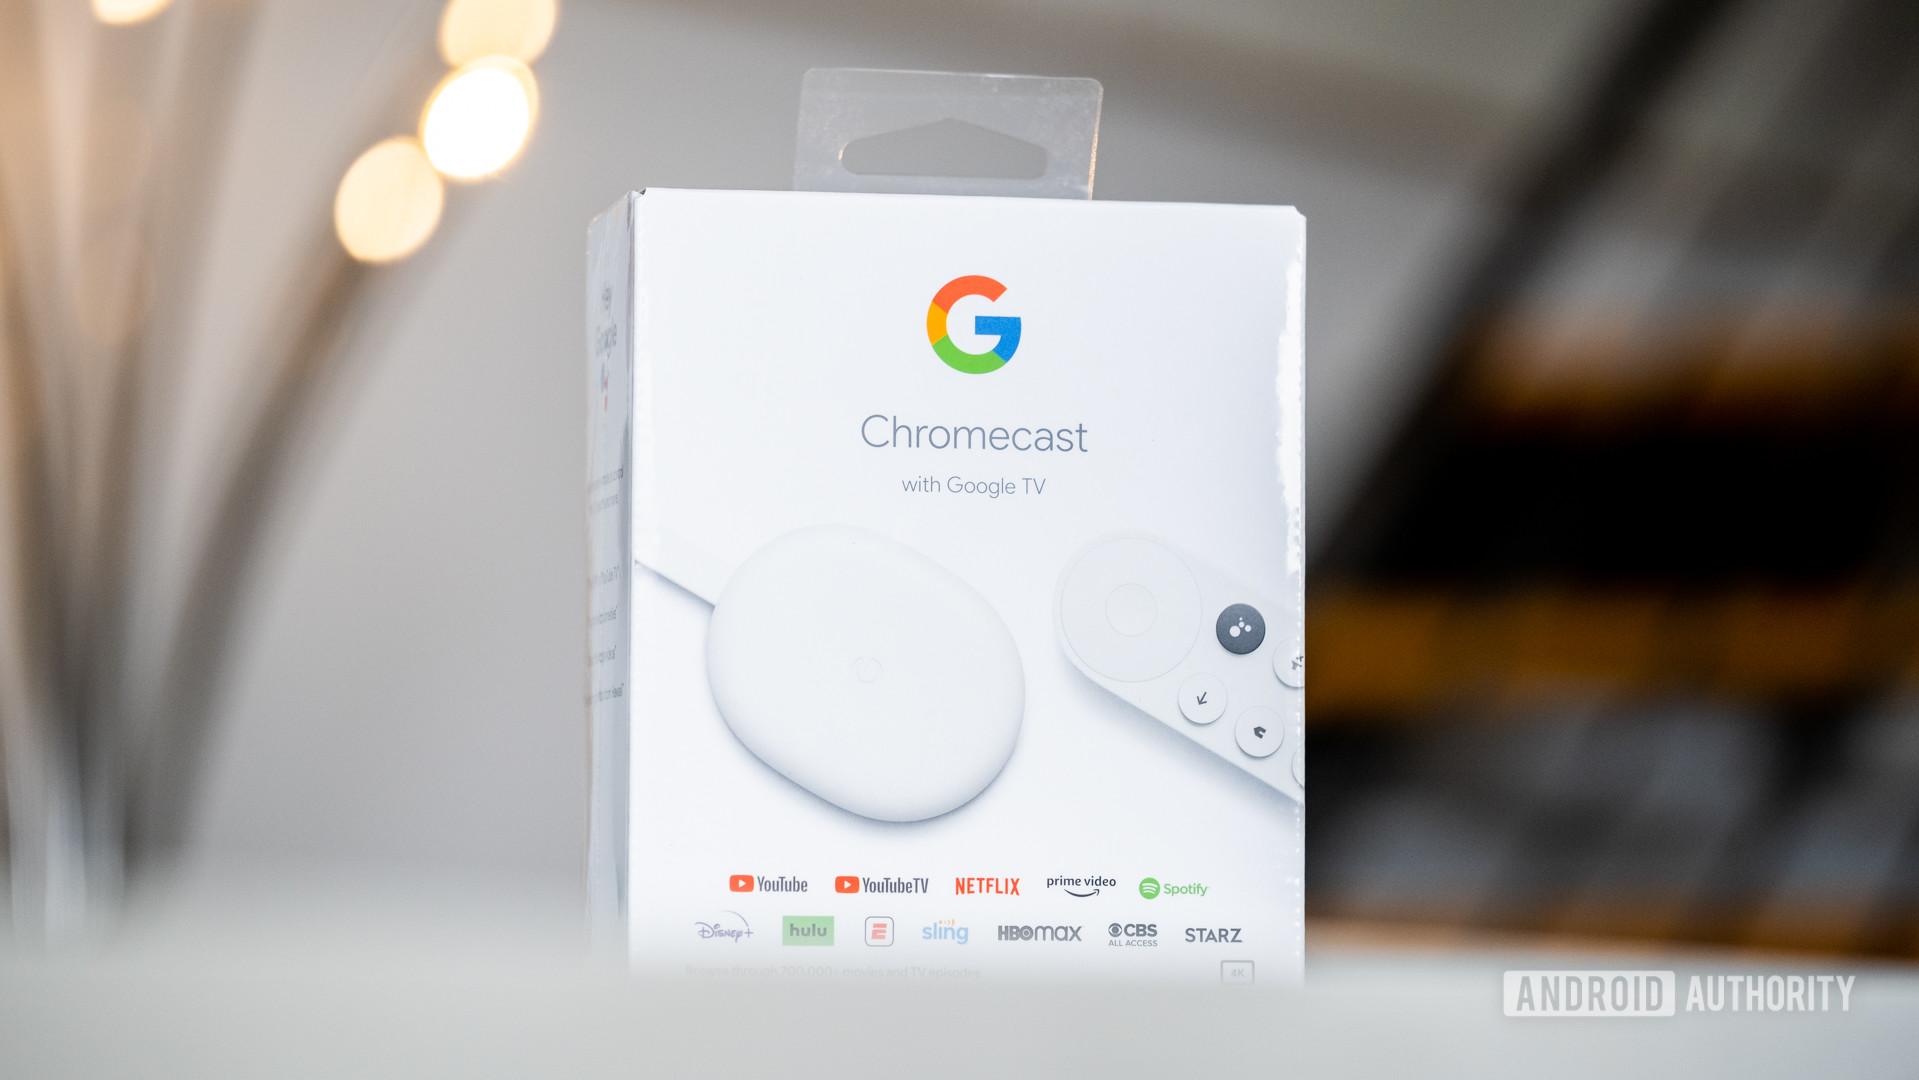 Google Chromecast with Google TV box